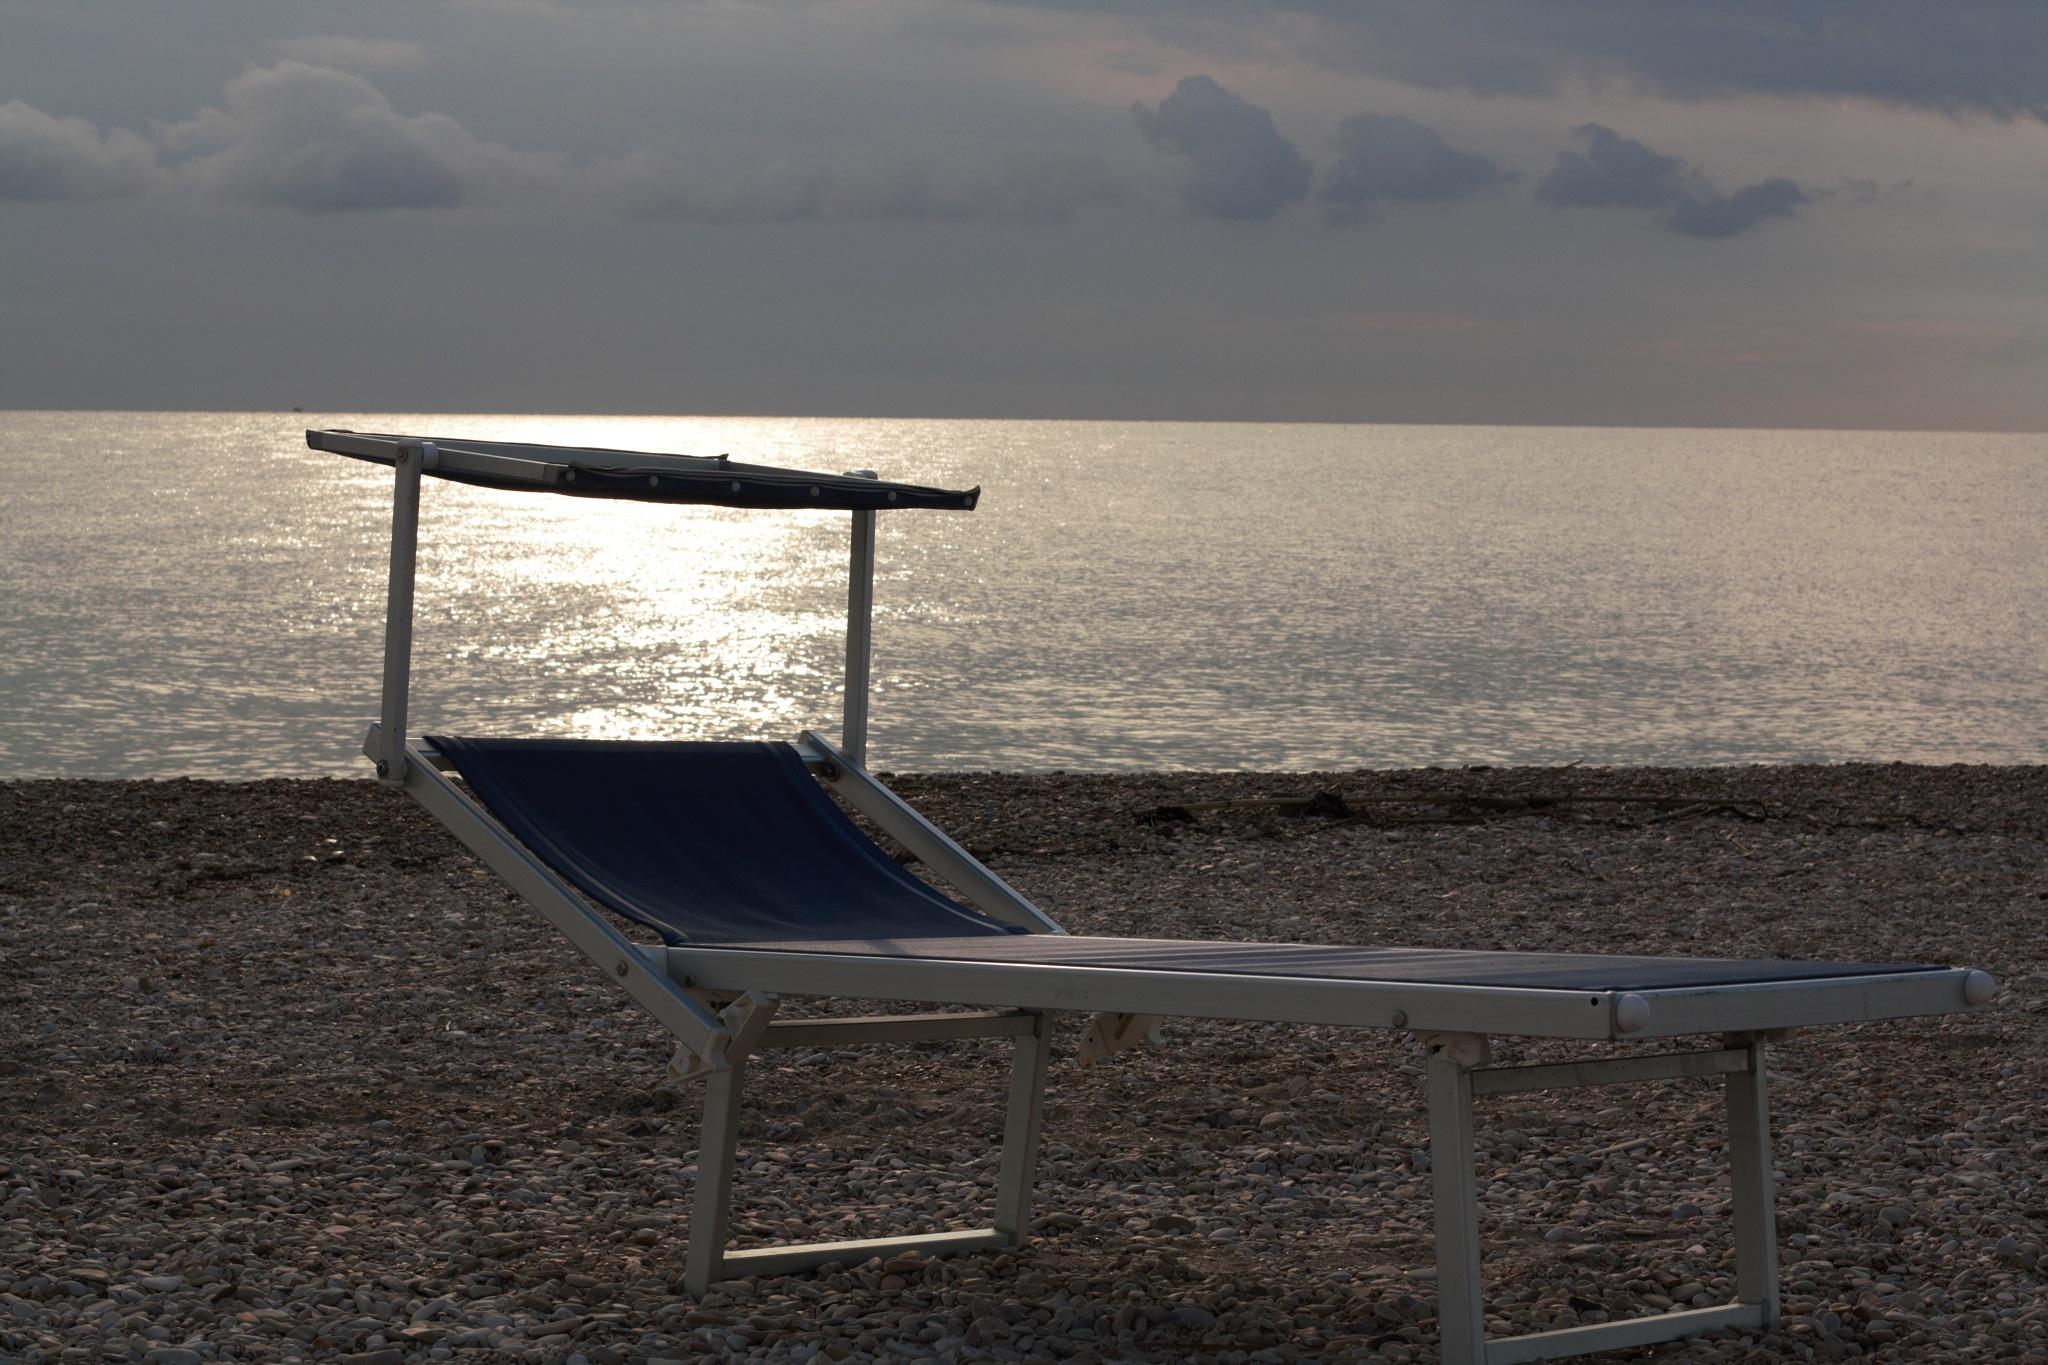 Early morning on the beach by Ghislain